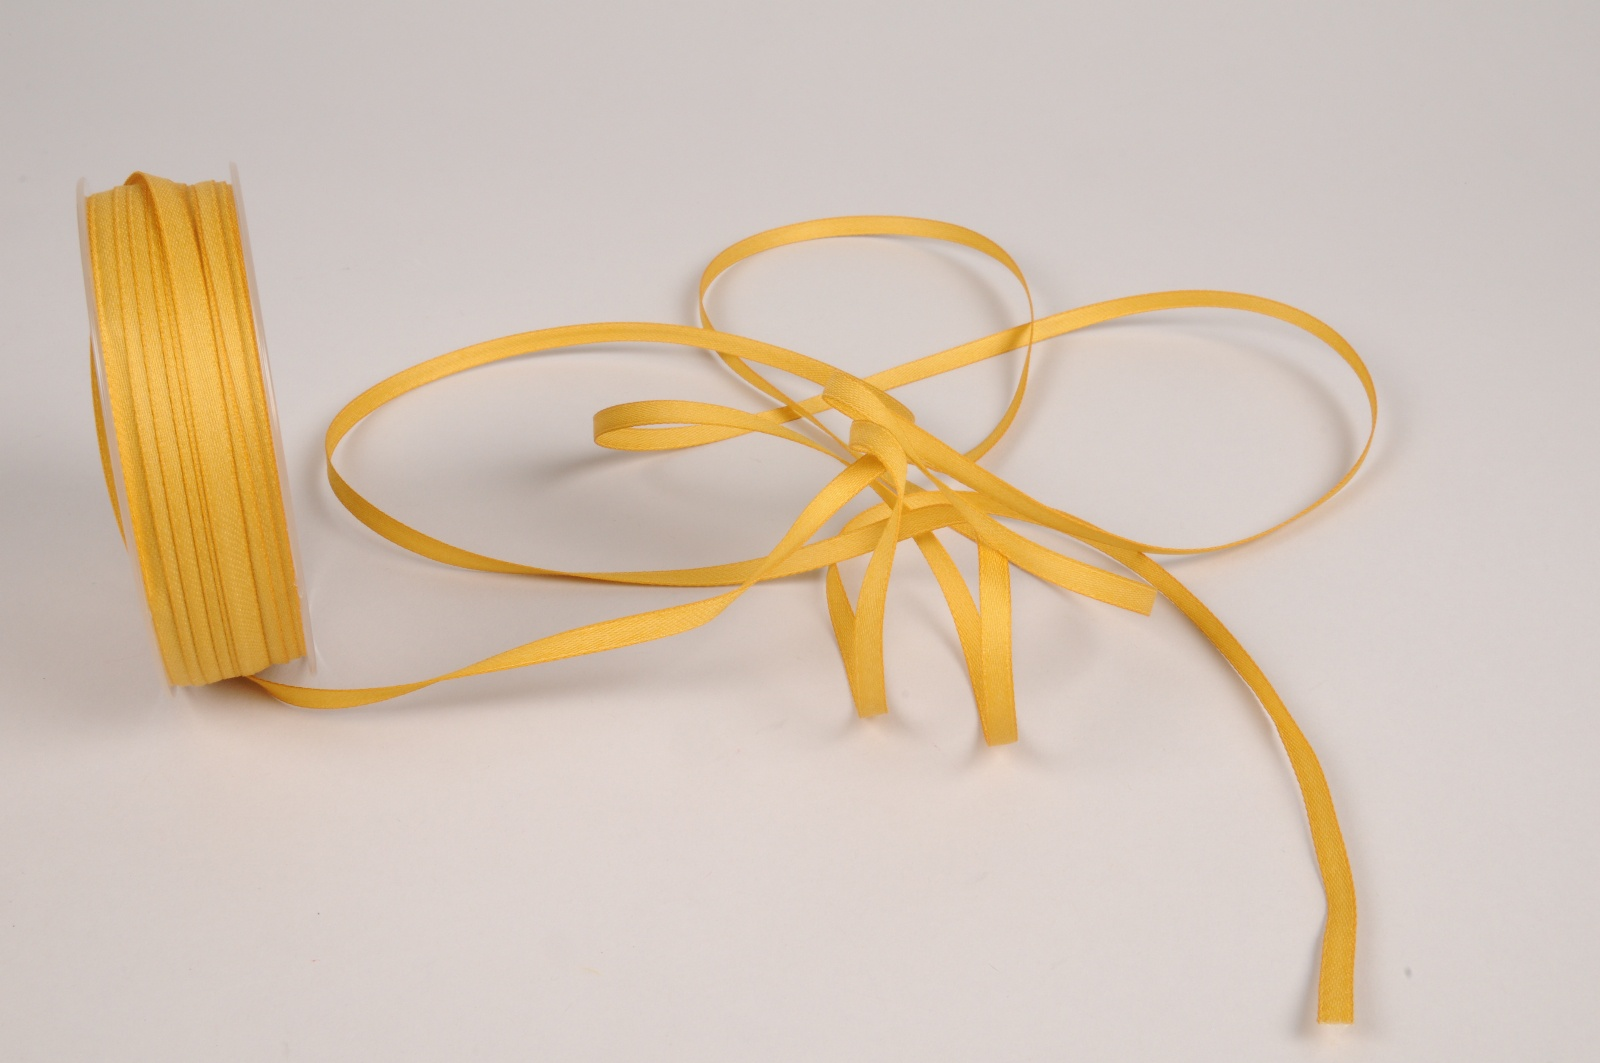 A807UN Ruban satin moutarde 5mm x 70m